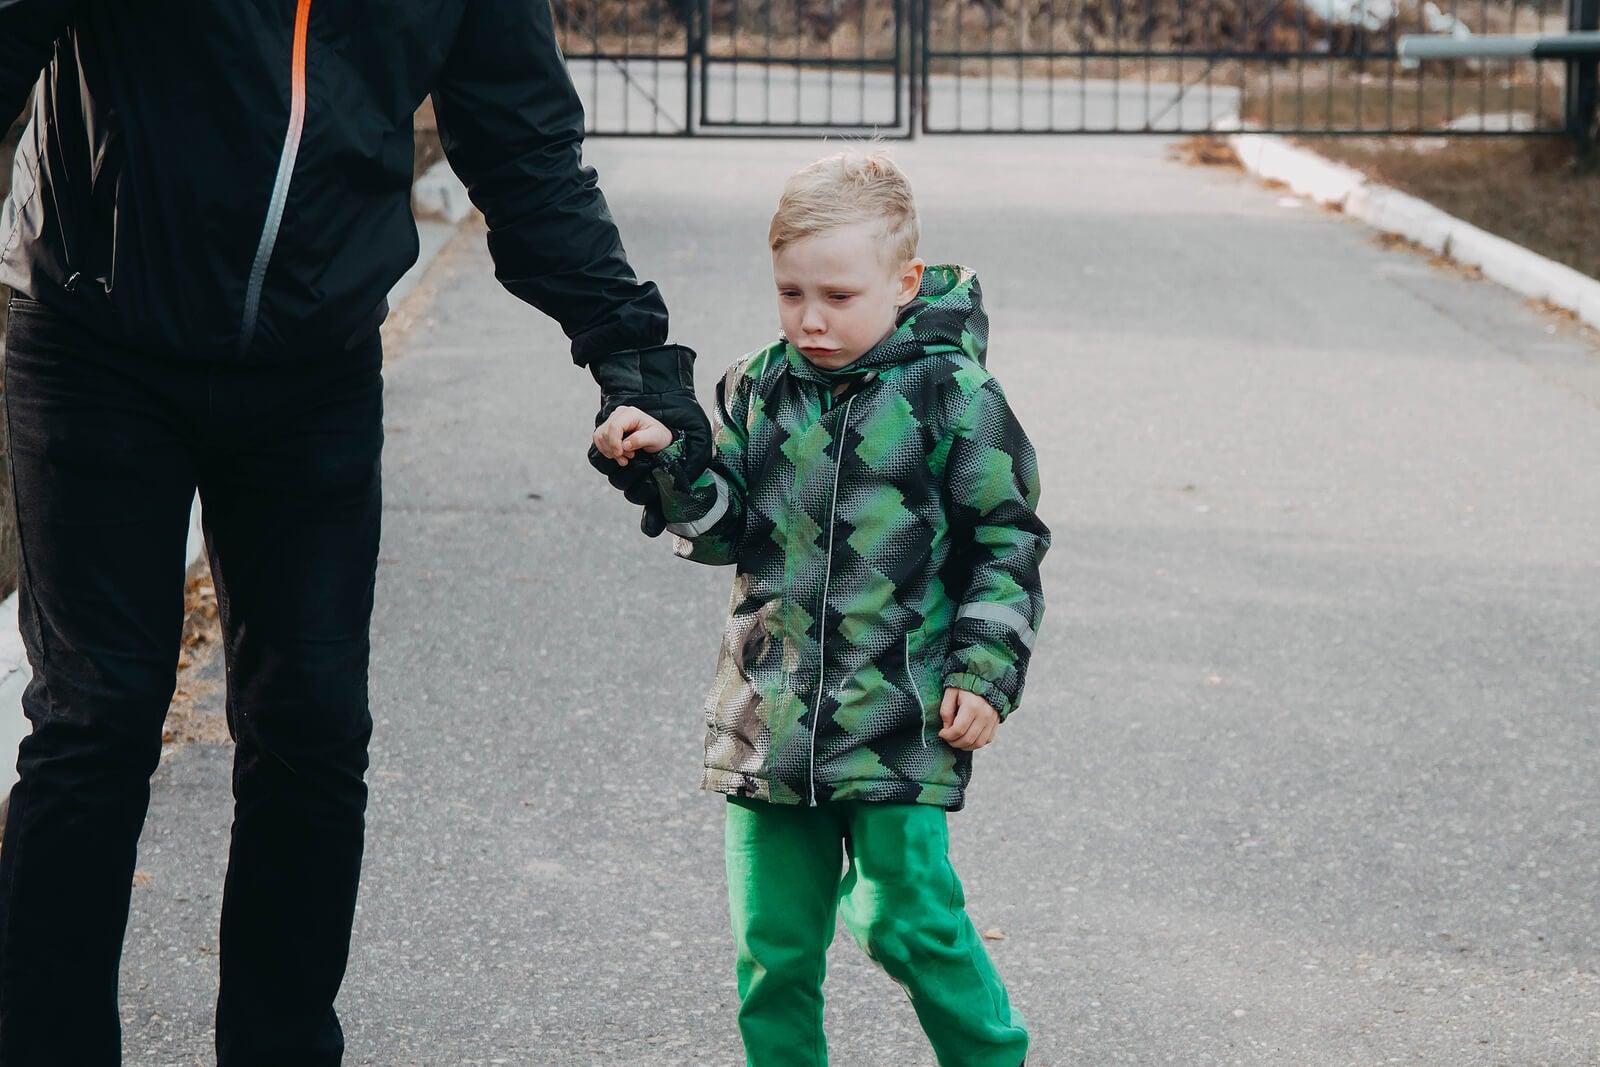 Niño llorando triste de la mano de su padre.